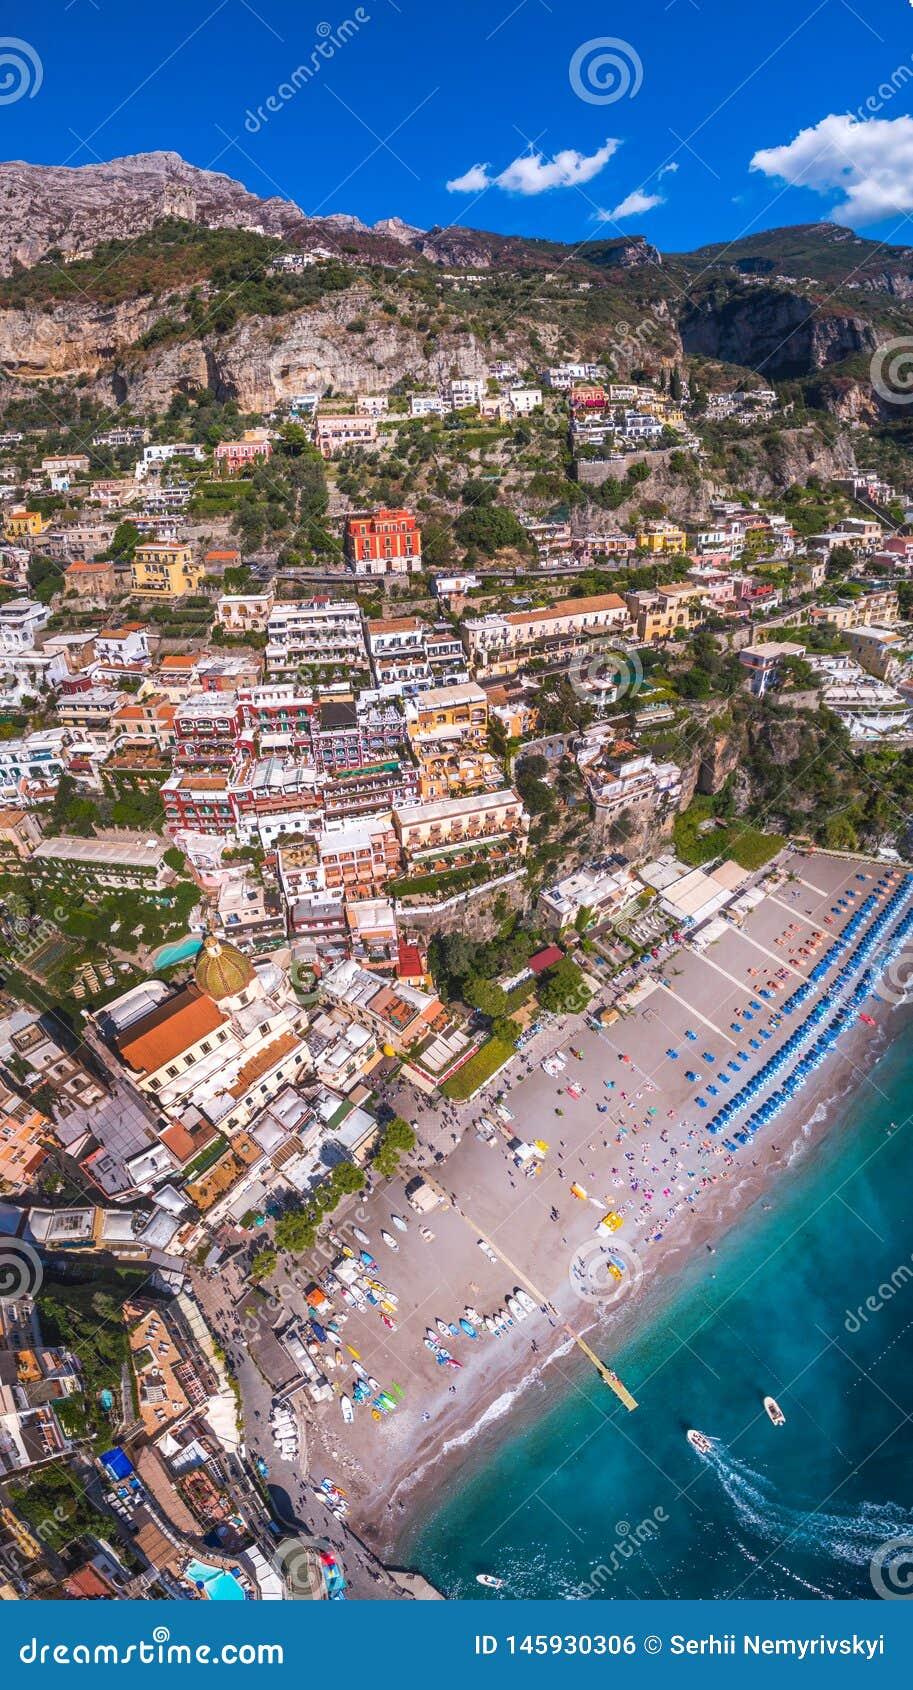 Satellietbeeld van Positano-foto, mooi Mediterraan dorp op Amalfi Kust Costiera Amalfitana, beste plaats in Itali?, reis